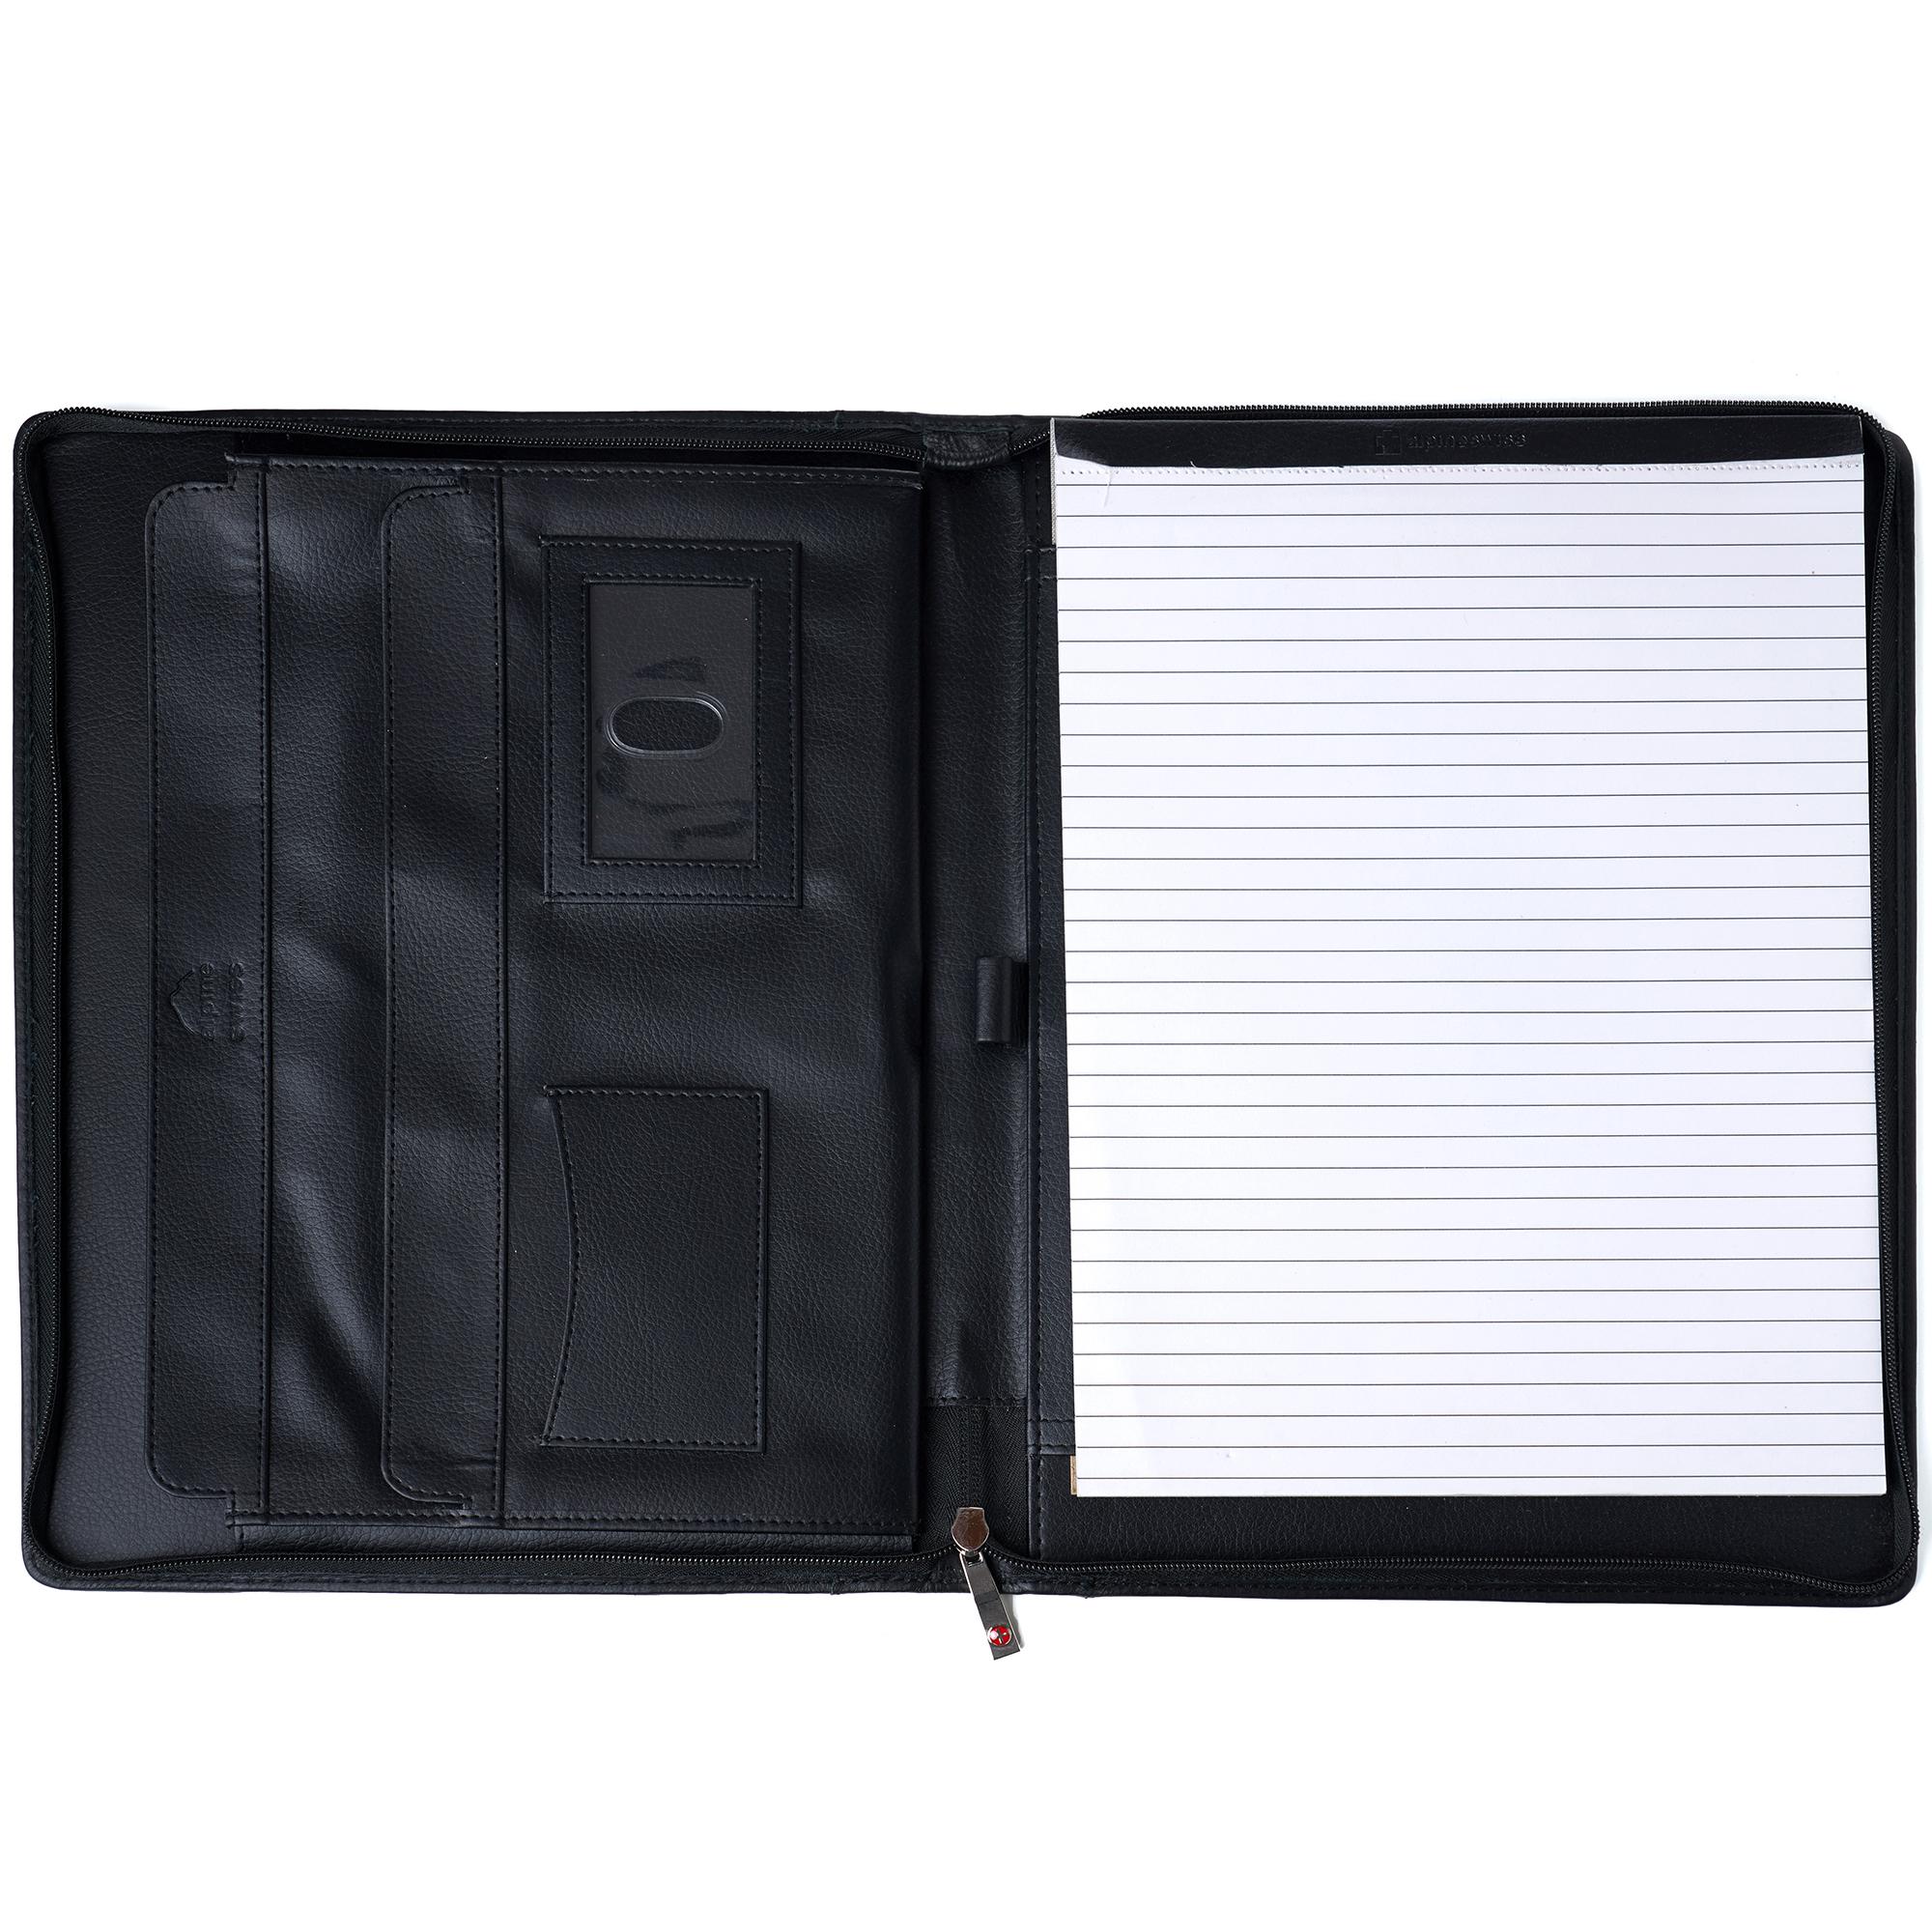 thumbnail 14 - Alpine Swiss Leather Zippered Writing Pad Portfolio Business Briefcase Organizer